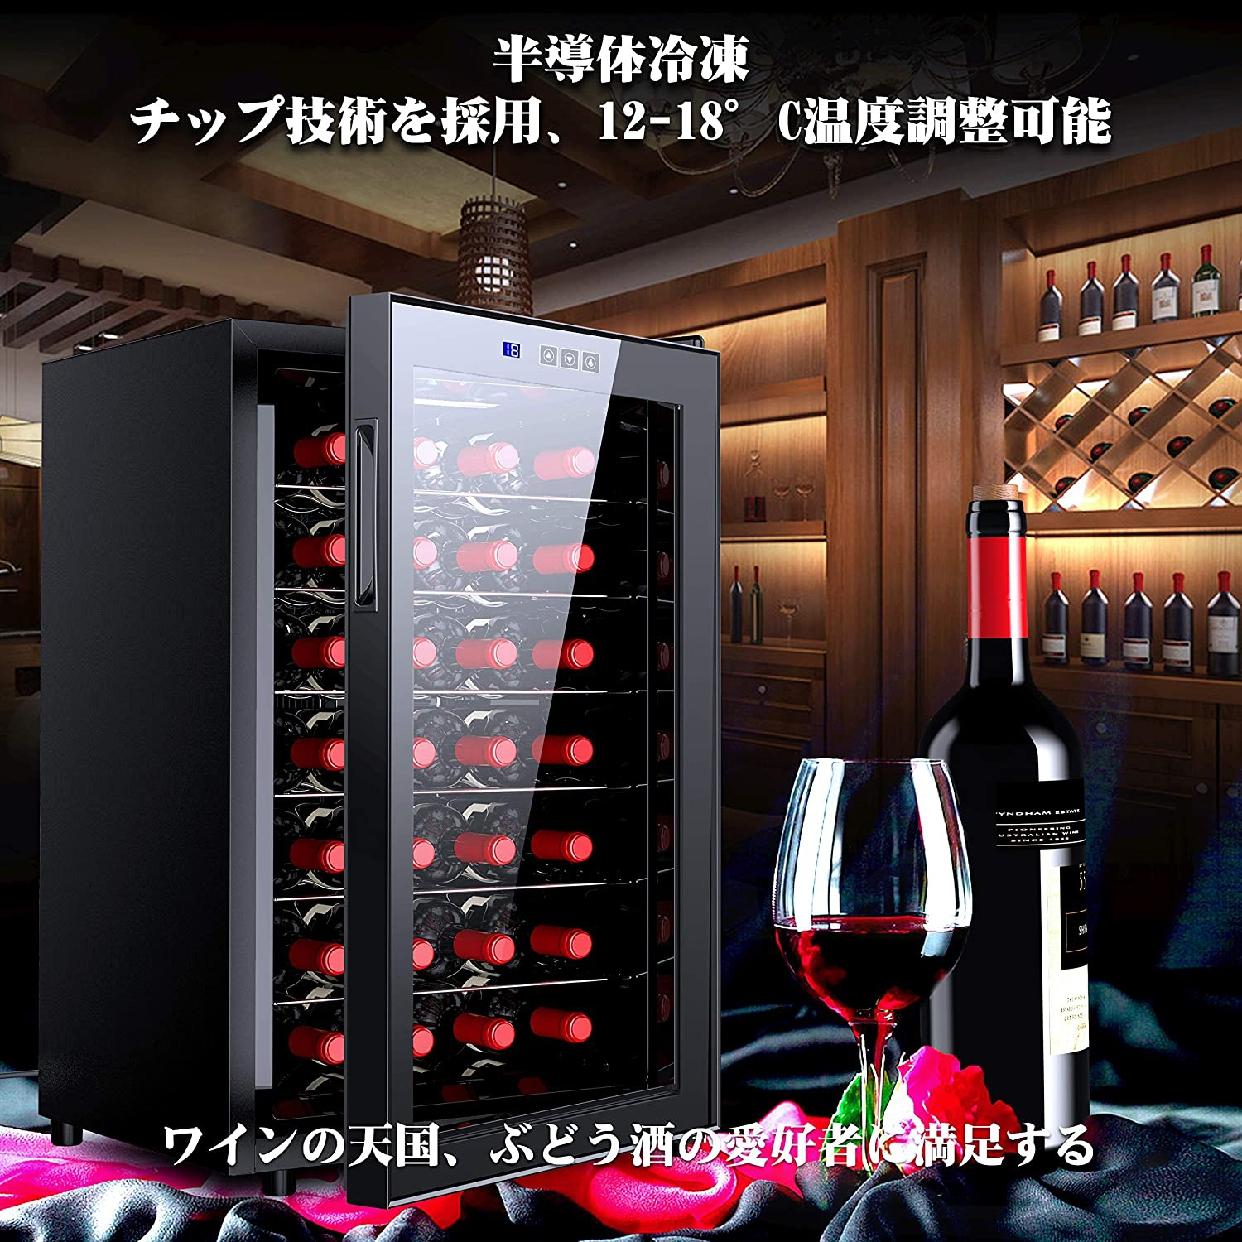 Audew(アウデュー) ワインセラー 28本収納の商品画像2